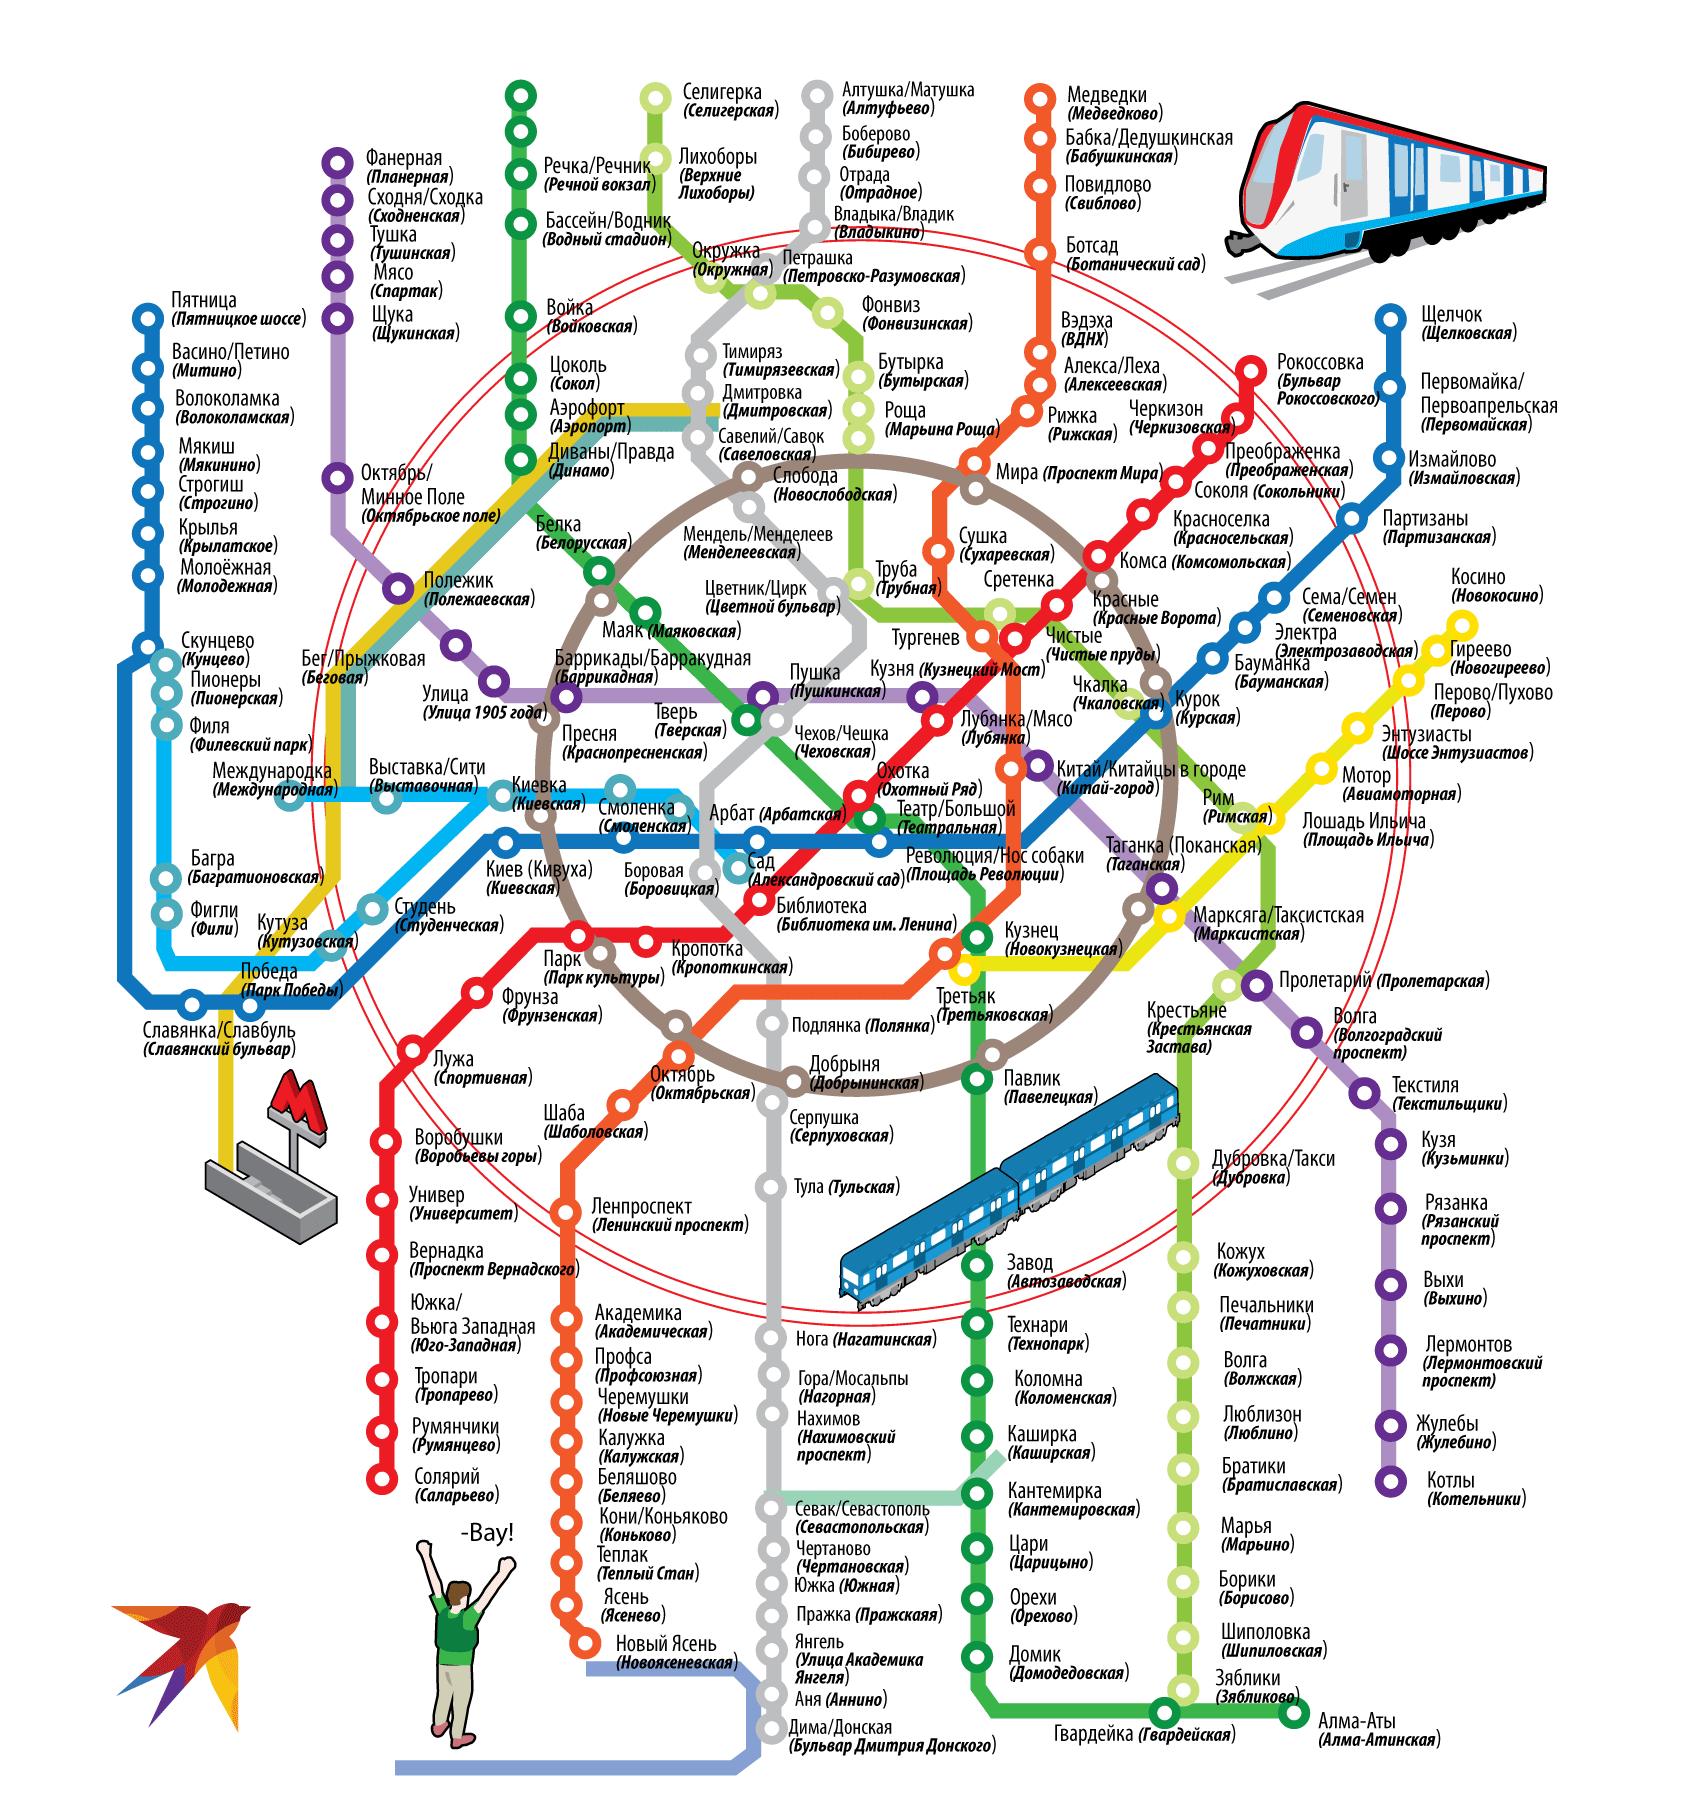 Народная карта метро